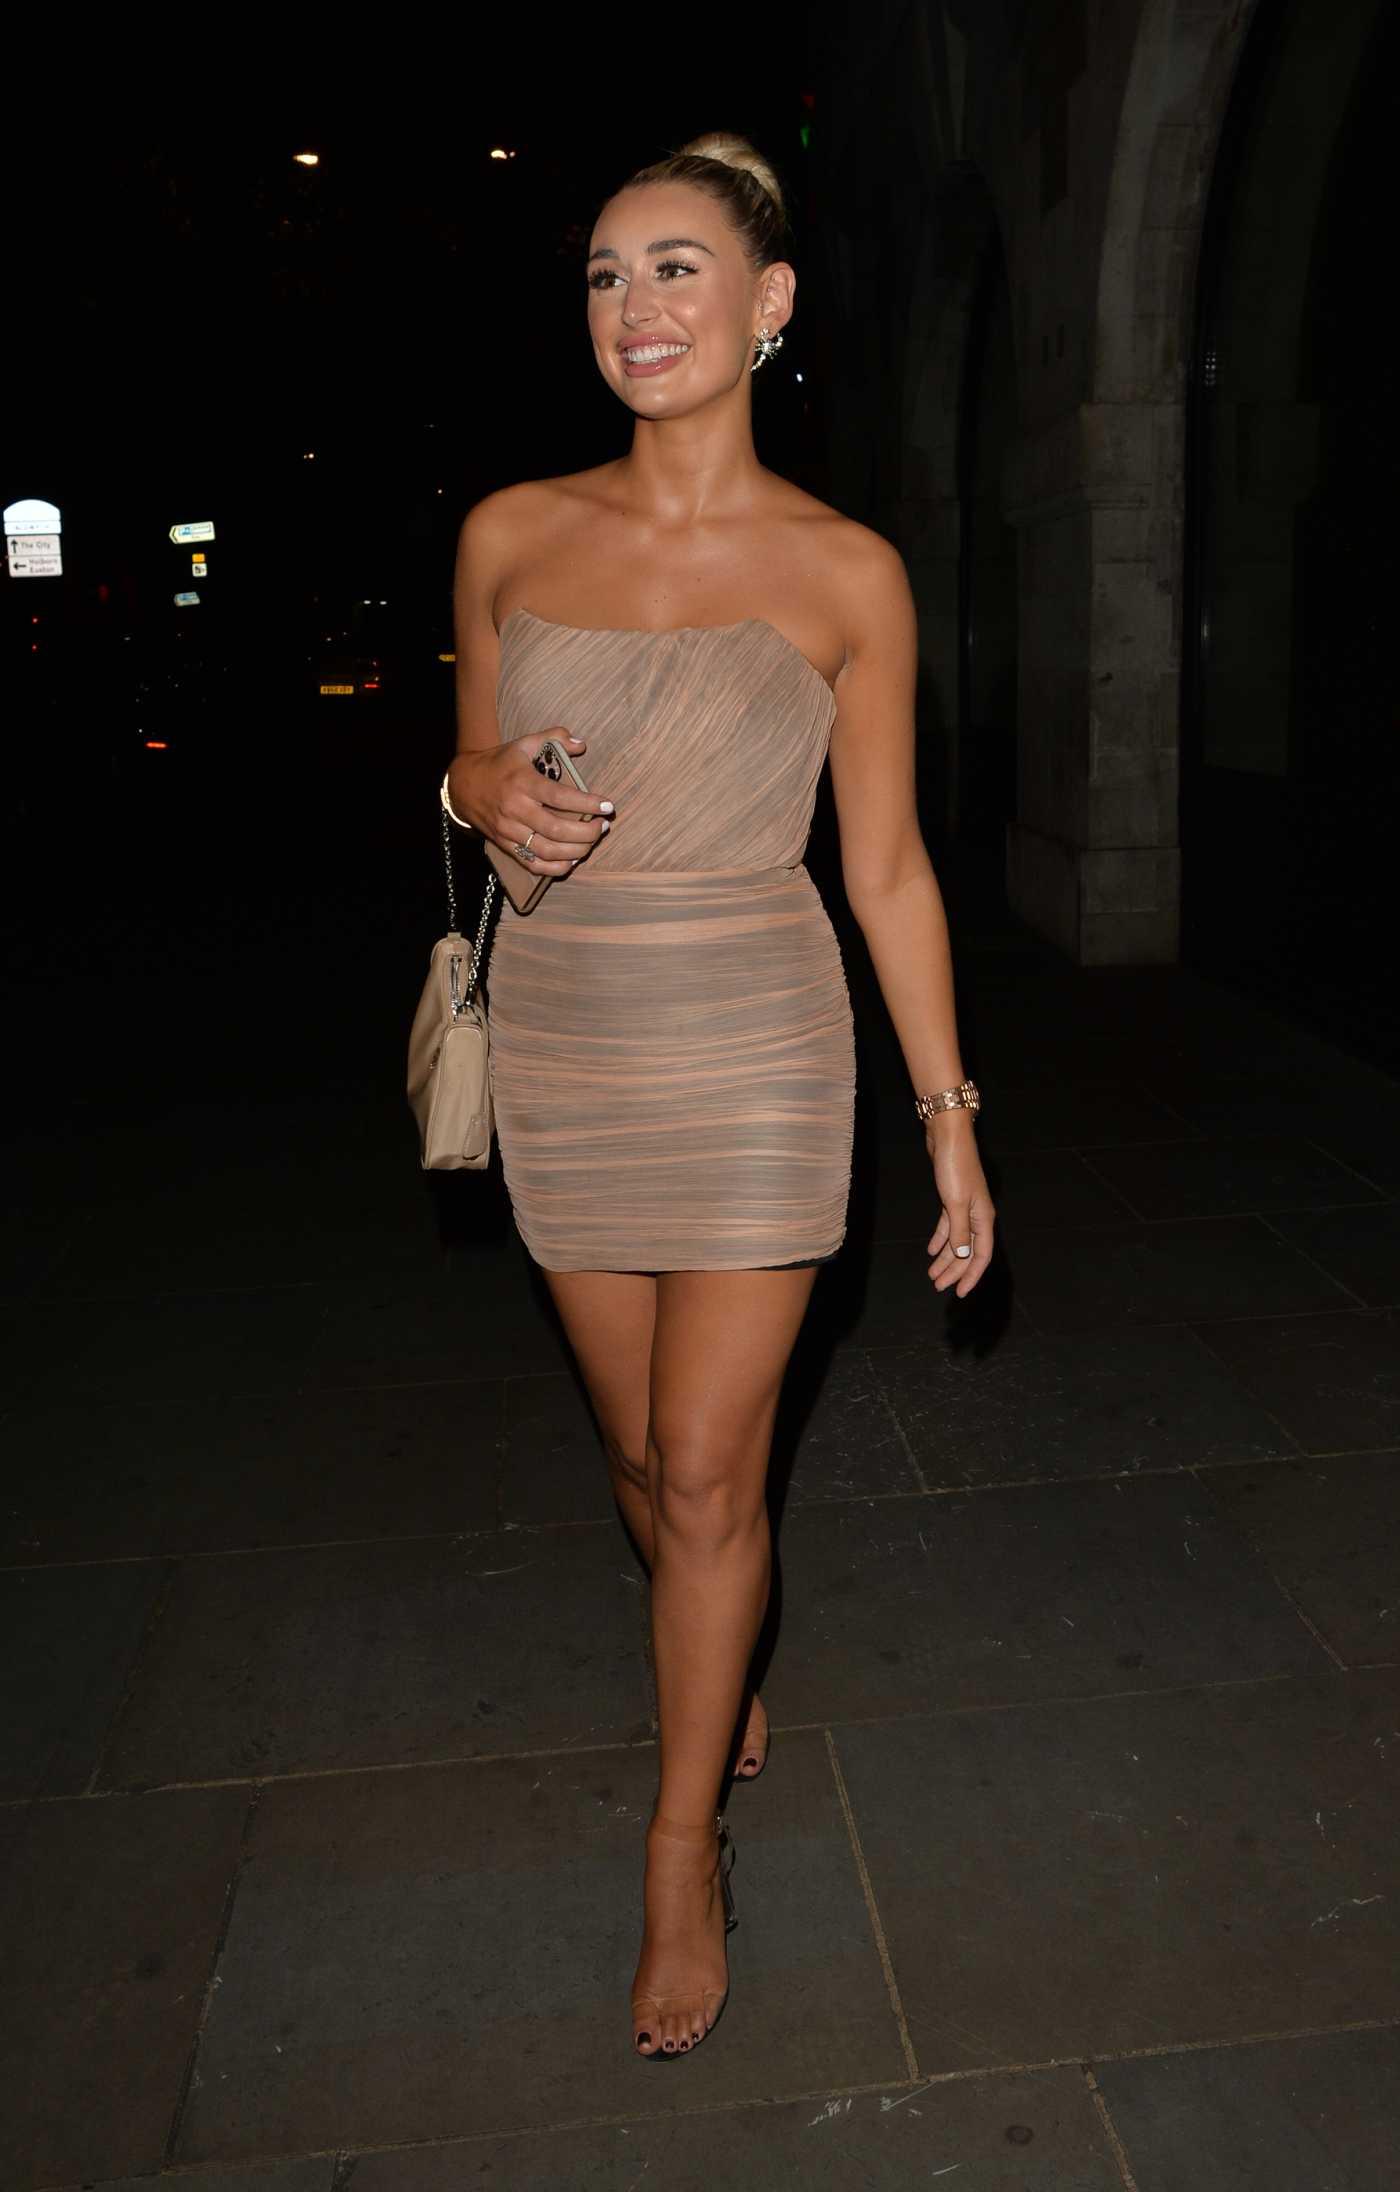 Rachel Fenton in a Beige Dress Heads Out for Dinner at Stk Restaurant in London 07/11/2020